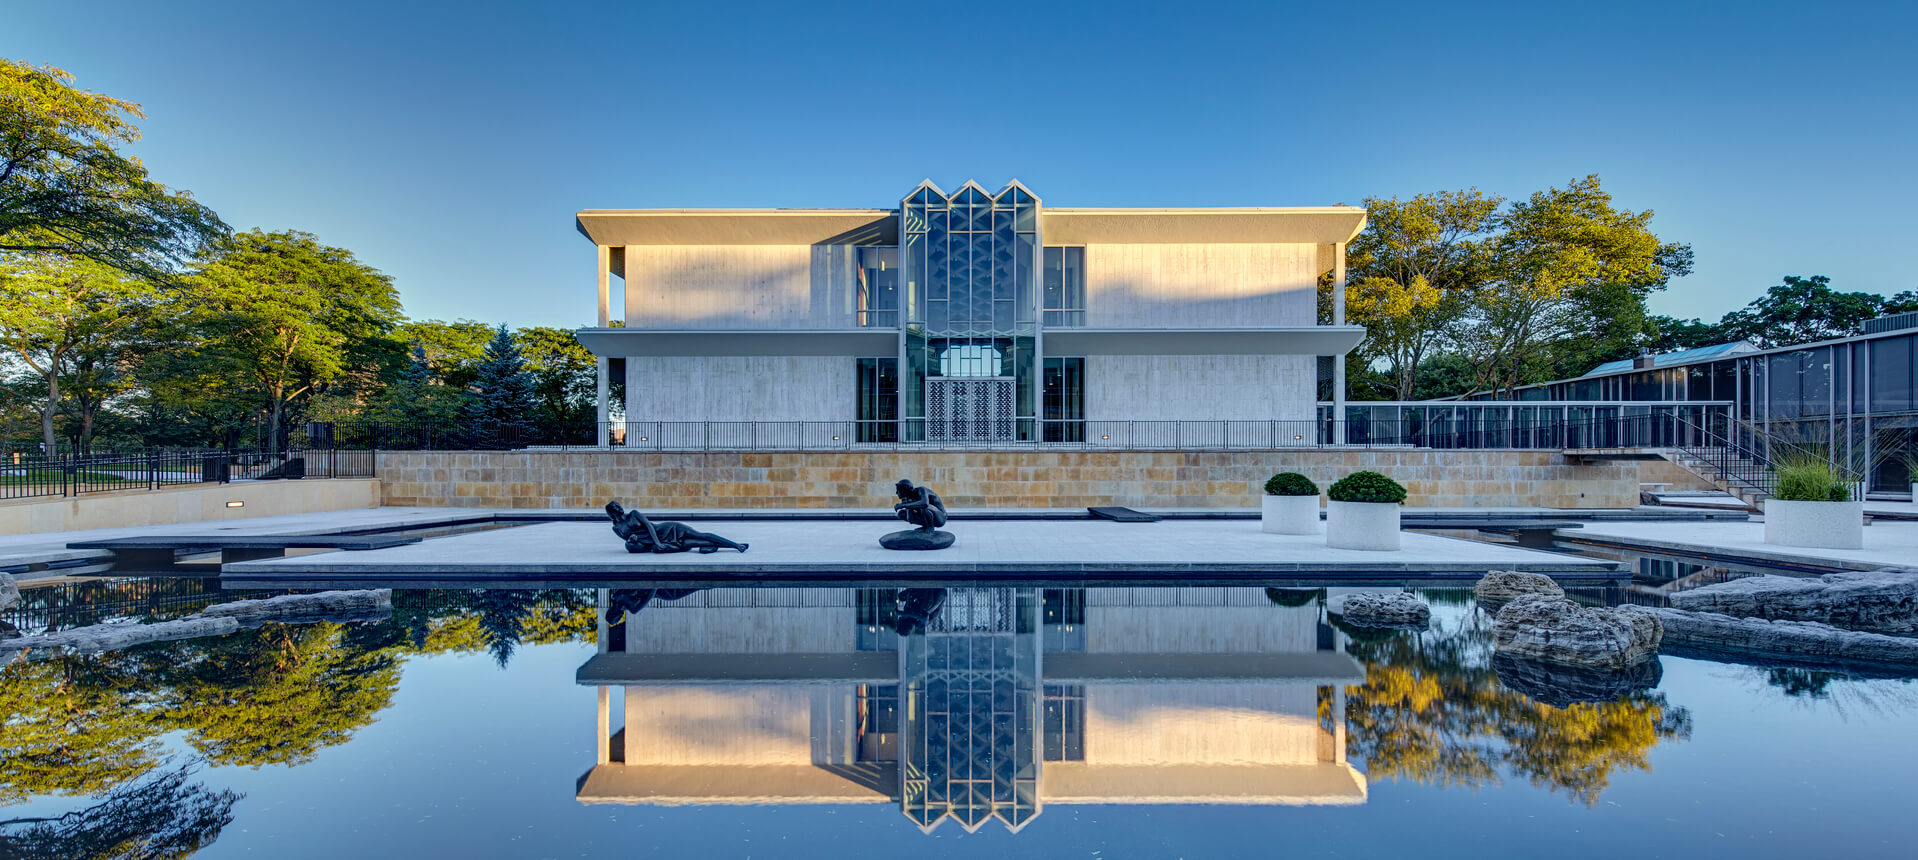 McGregor Reflecting Pool & Sculpture Gardens — Quinn Evans